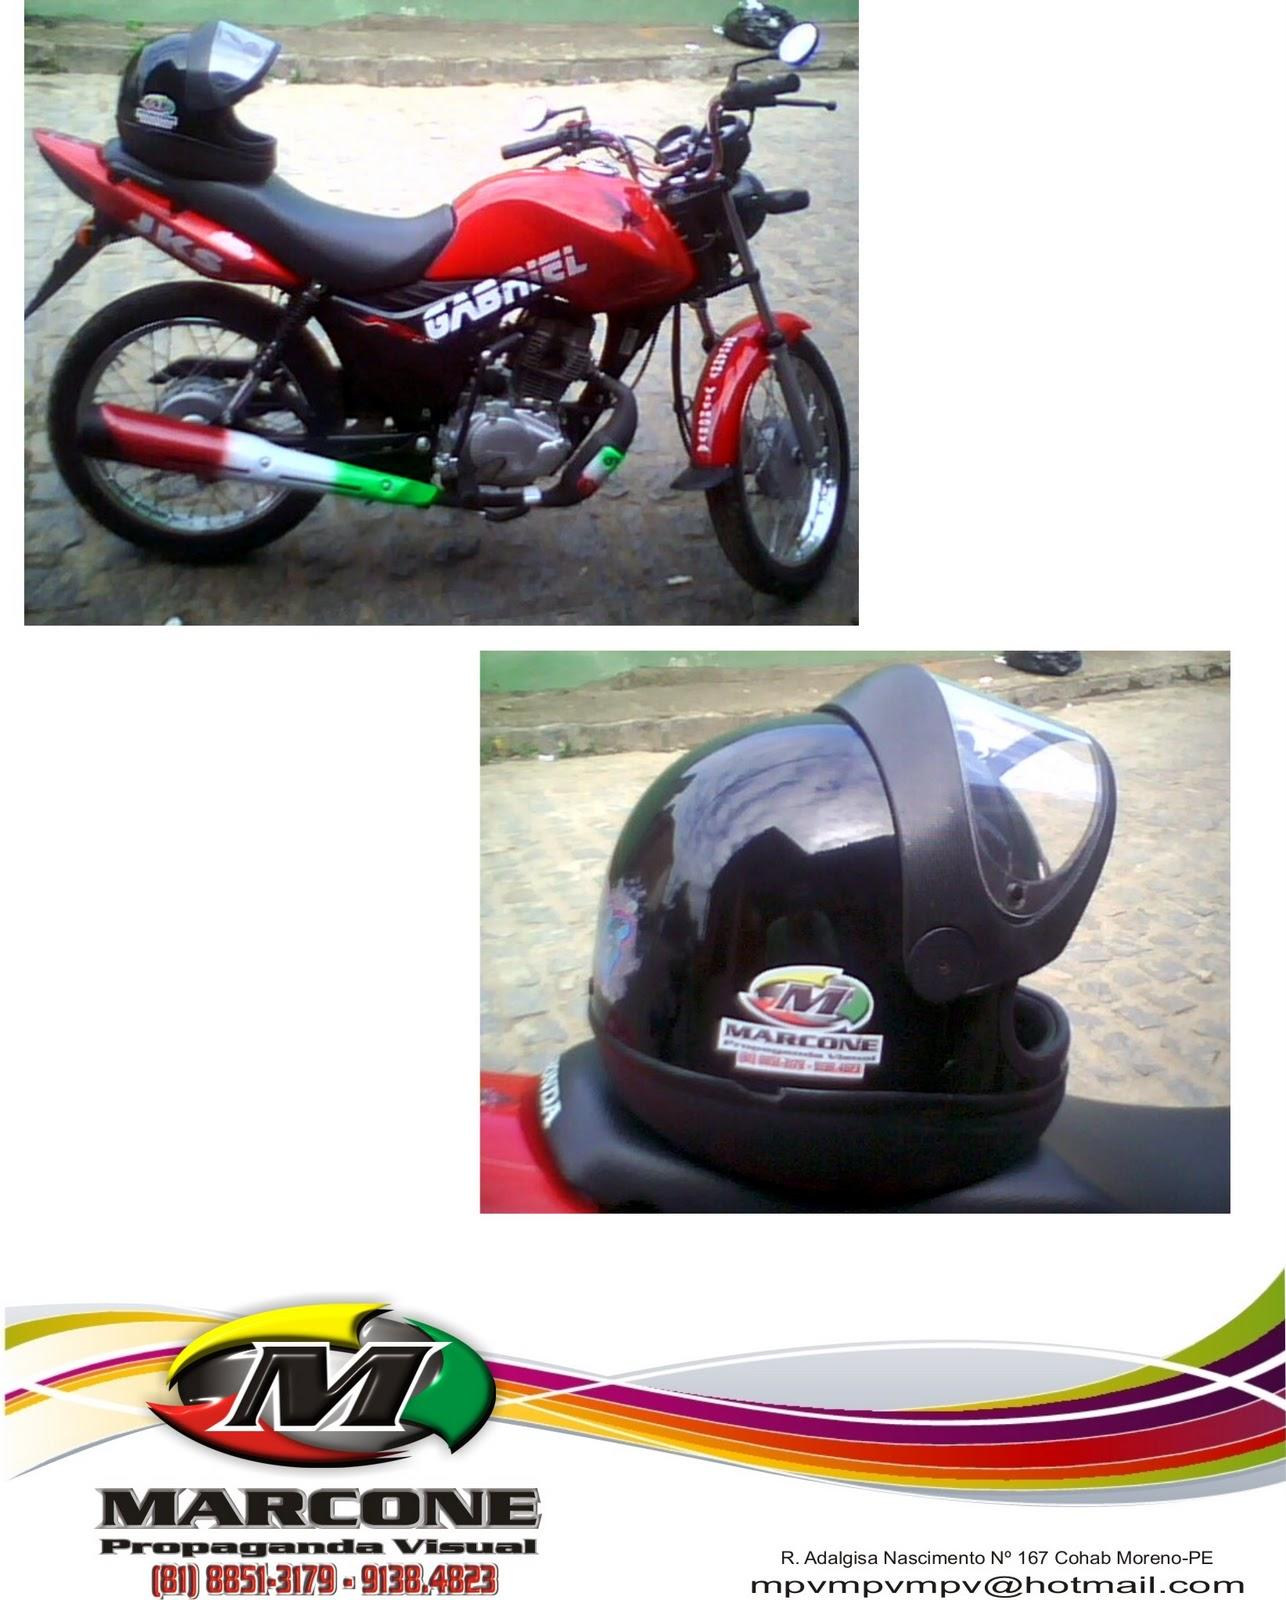 Artesanato Fortaleza Loja ~ Marcone propaganda visual adesivo para moto